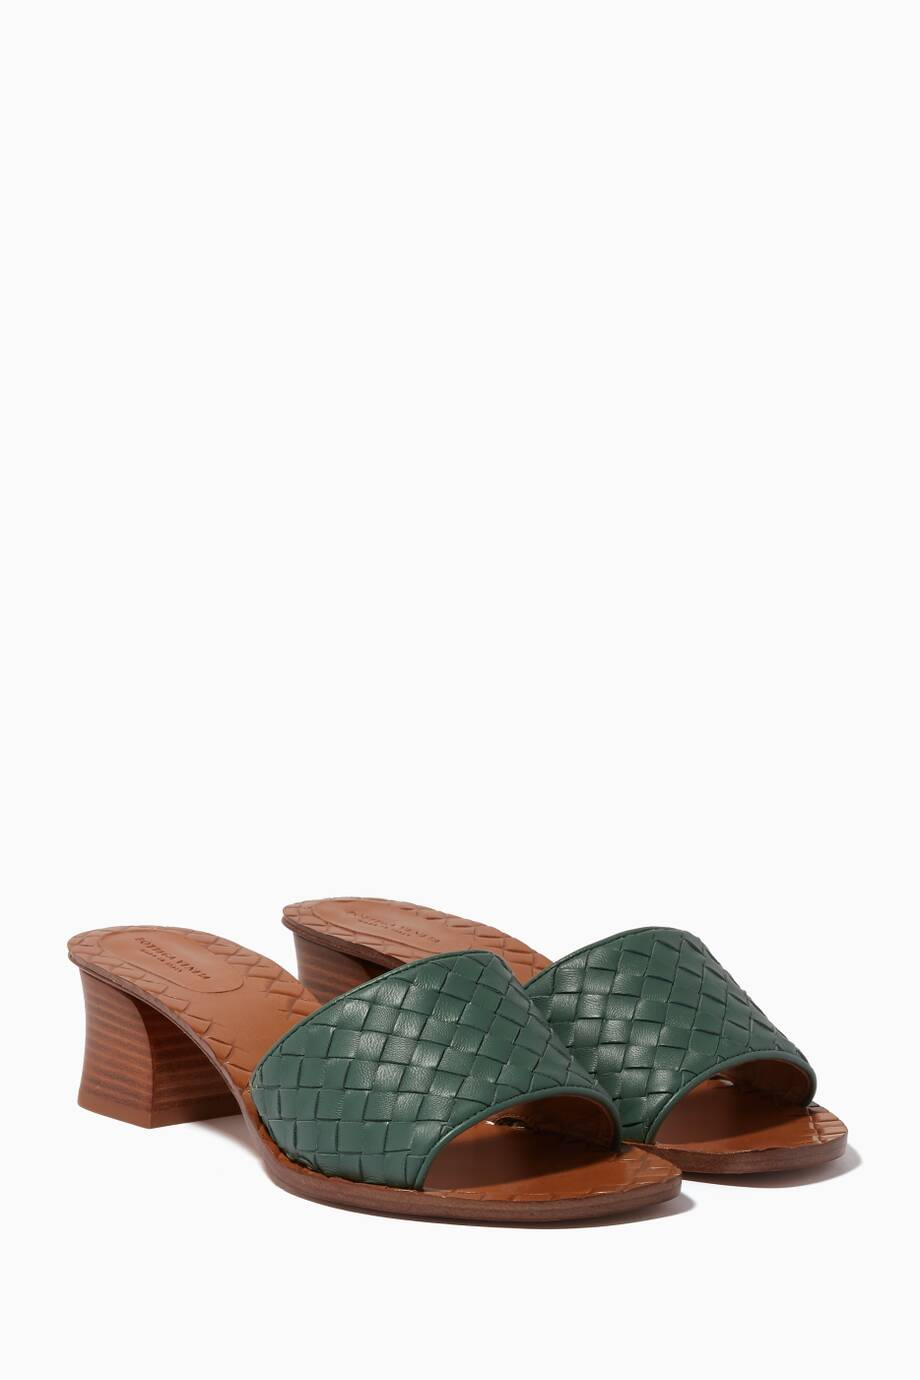 d5c559d0ef2a Shop Luxury Bottega Veneta Green Ravello Intrecciato Leather Sandals ...